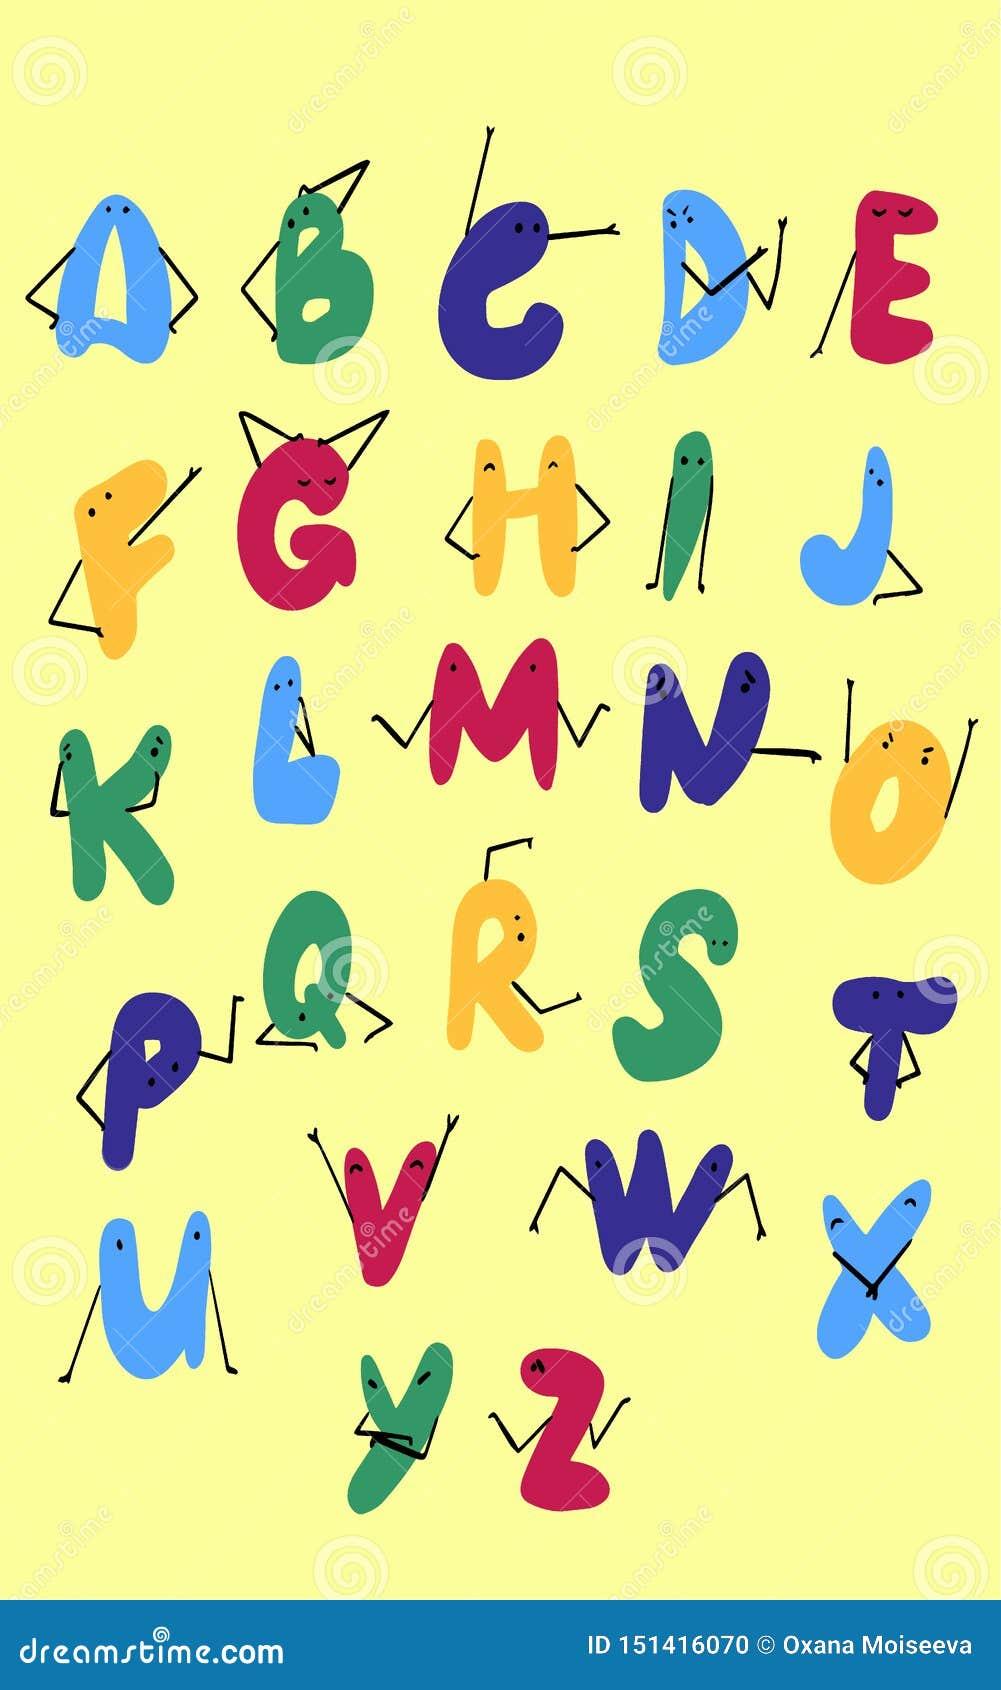 Alfabeto bonito da garatuja Fonte criançola da cor de DIY